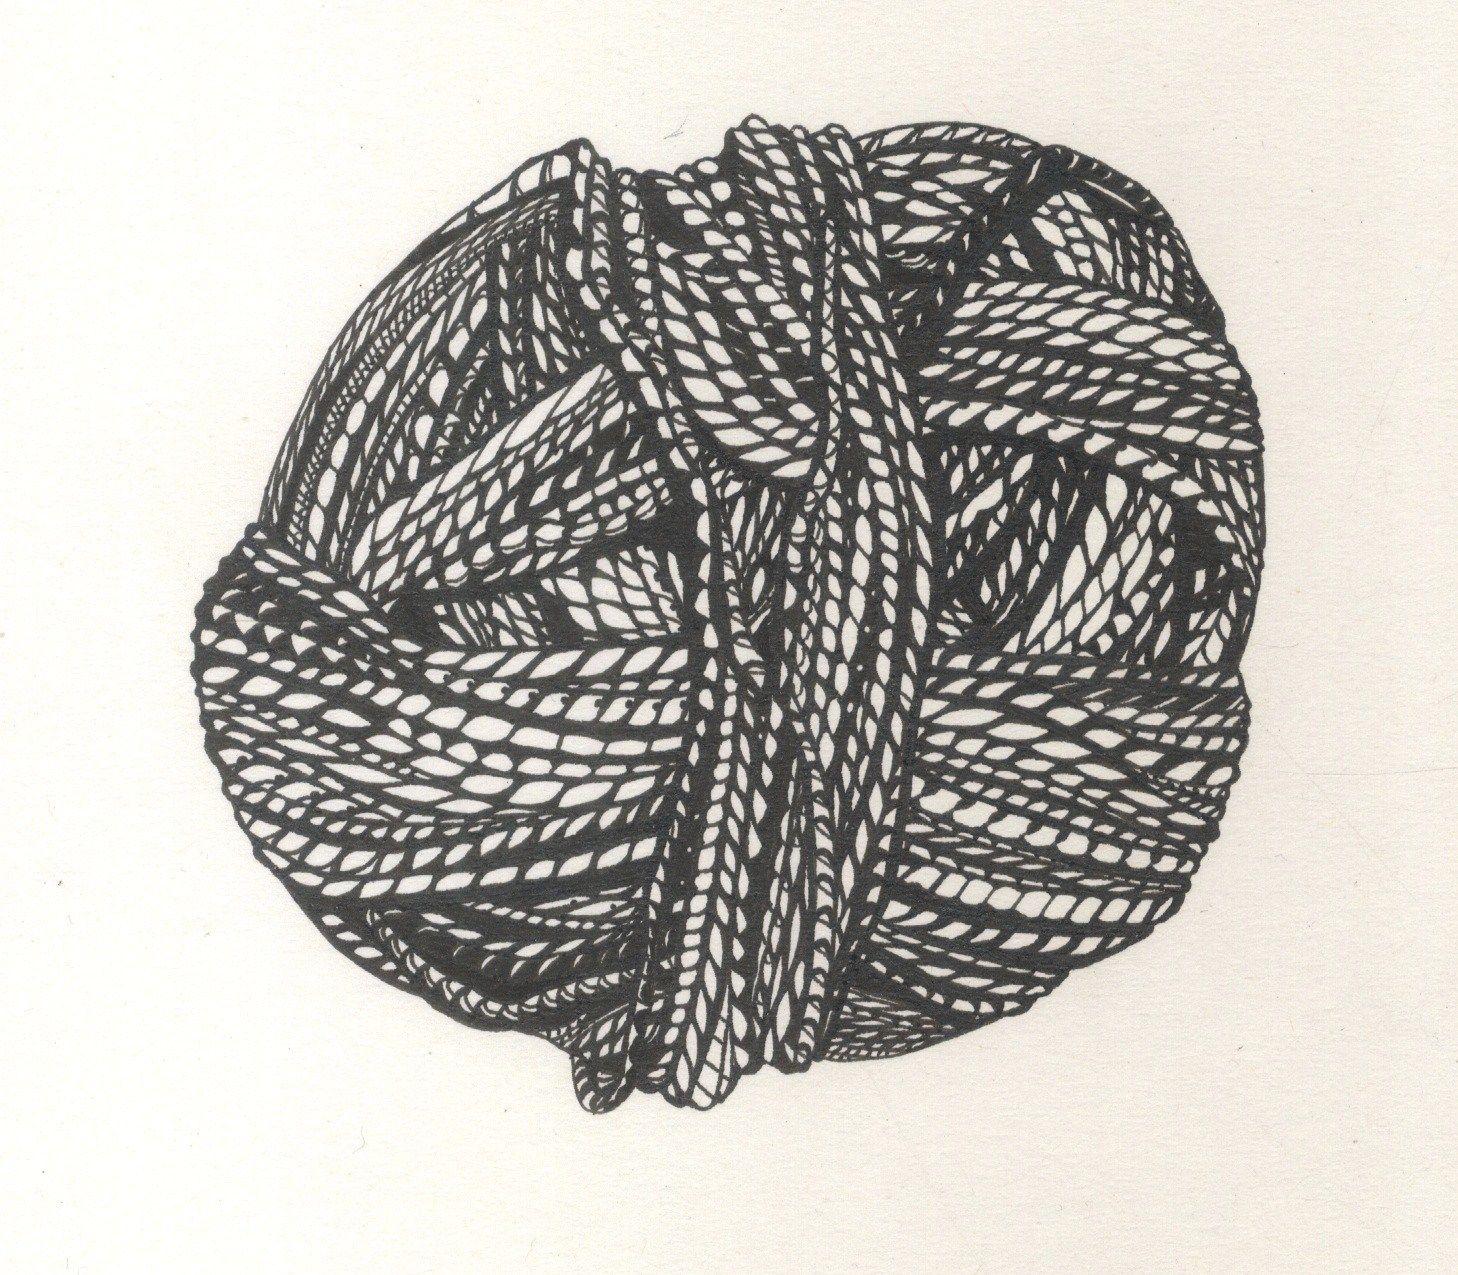 1458x1275 Ball Of Yarn Drawing